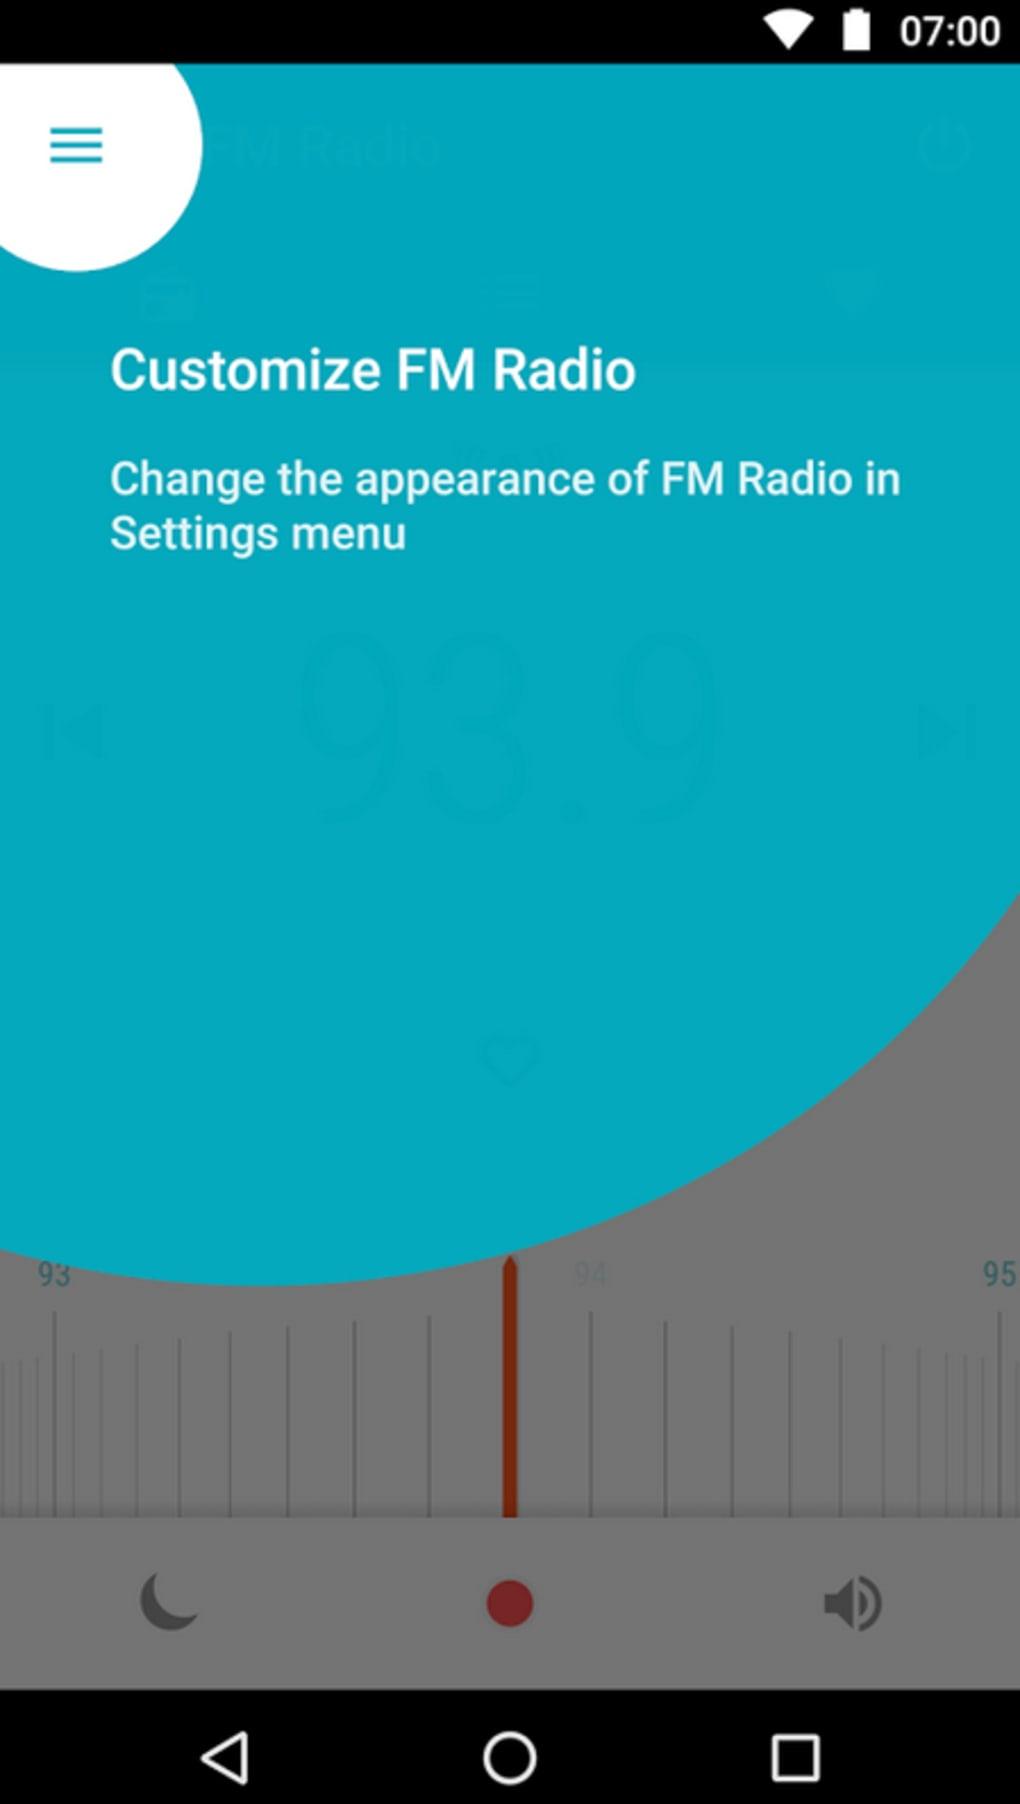 Motorola FM Radio for Android - Download